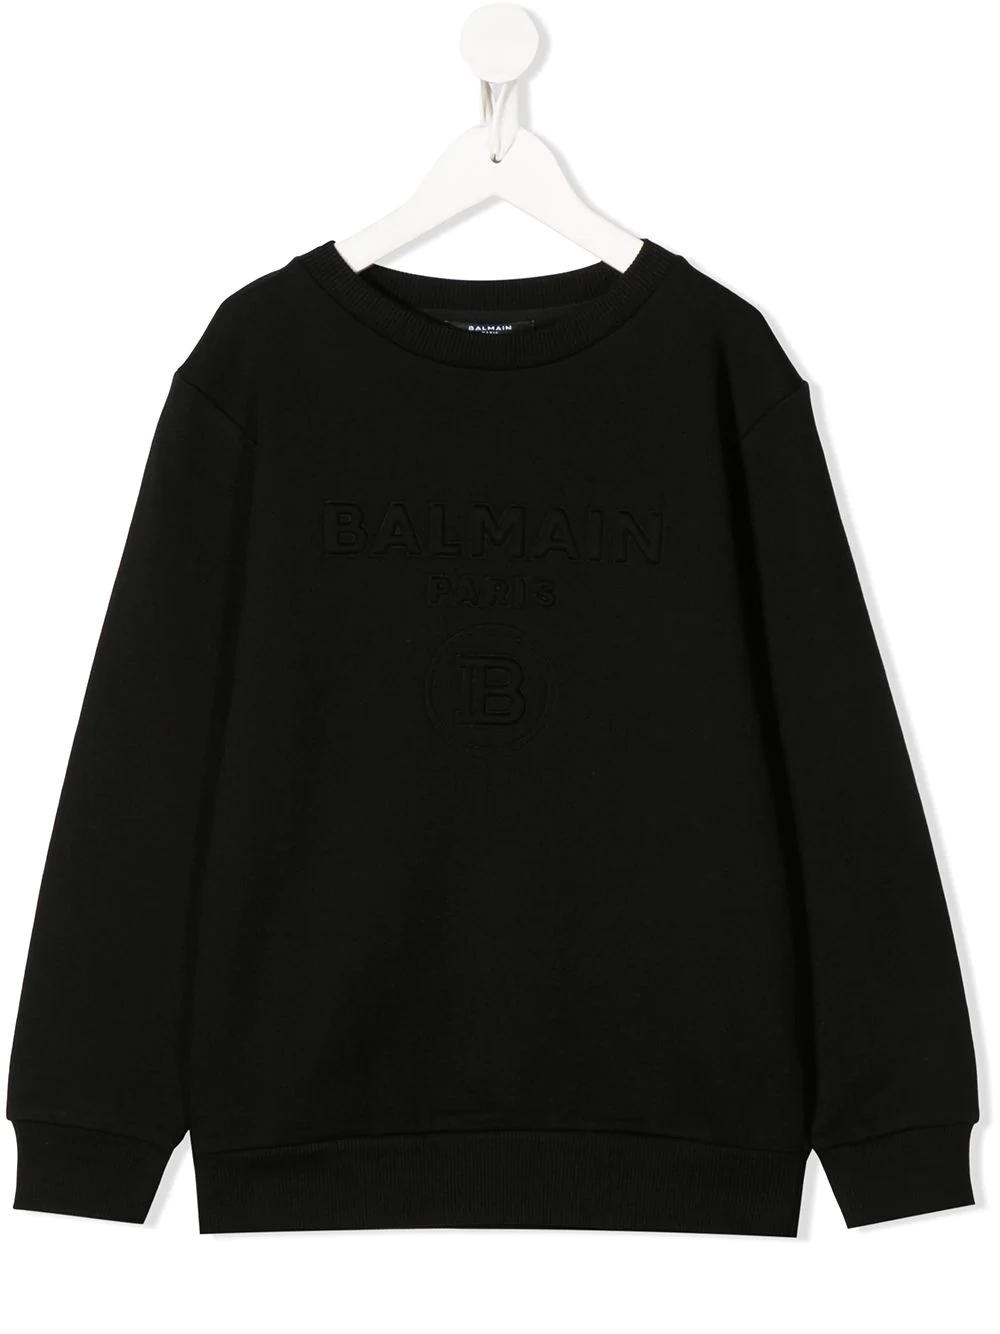 Sweatshirt Balmain kids  BALMAIN PARIS KIDS | -108764232 | 6M4740MX020930